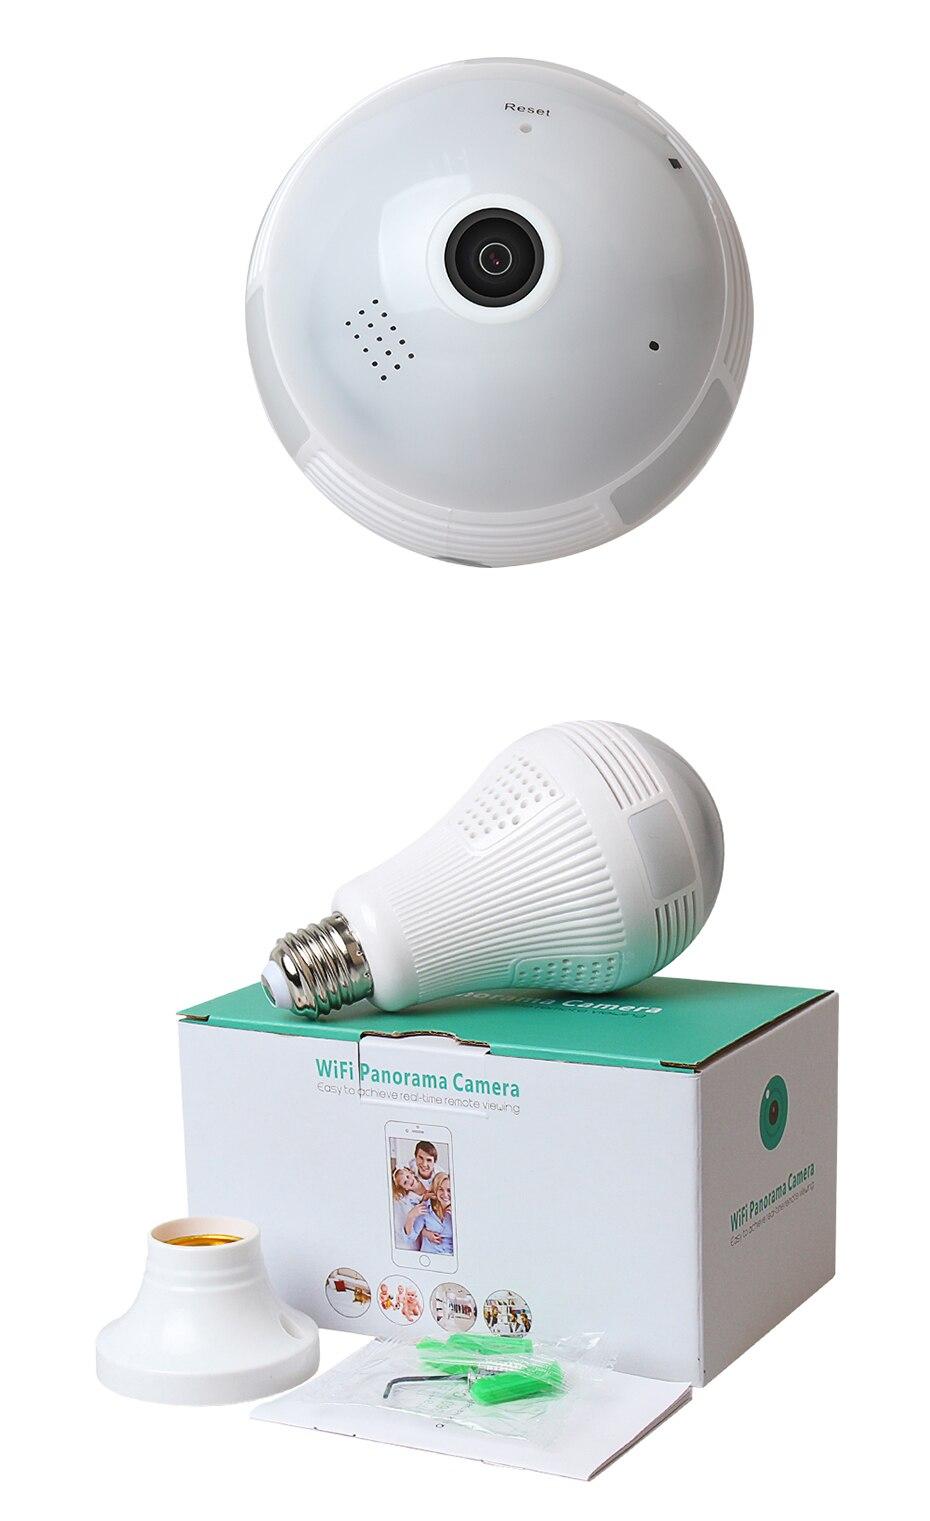 HTB1YwSrmRjTBKNjSZFuq6z0HFXaC Loosafe 960P 360 Security Wifi Camera Lamp Panoramic Camera Wifi IP Camera Fisheye Panoramic Surveillance Home Security IPCamera